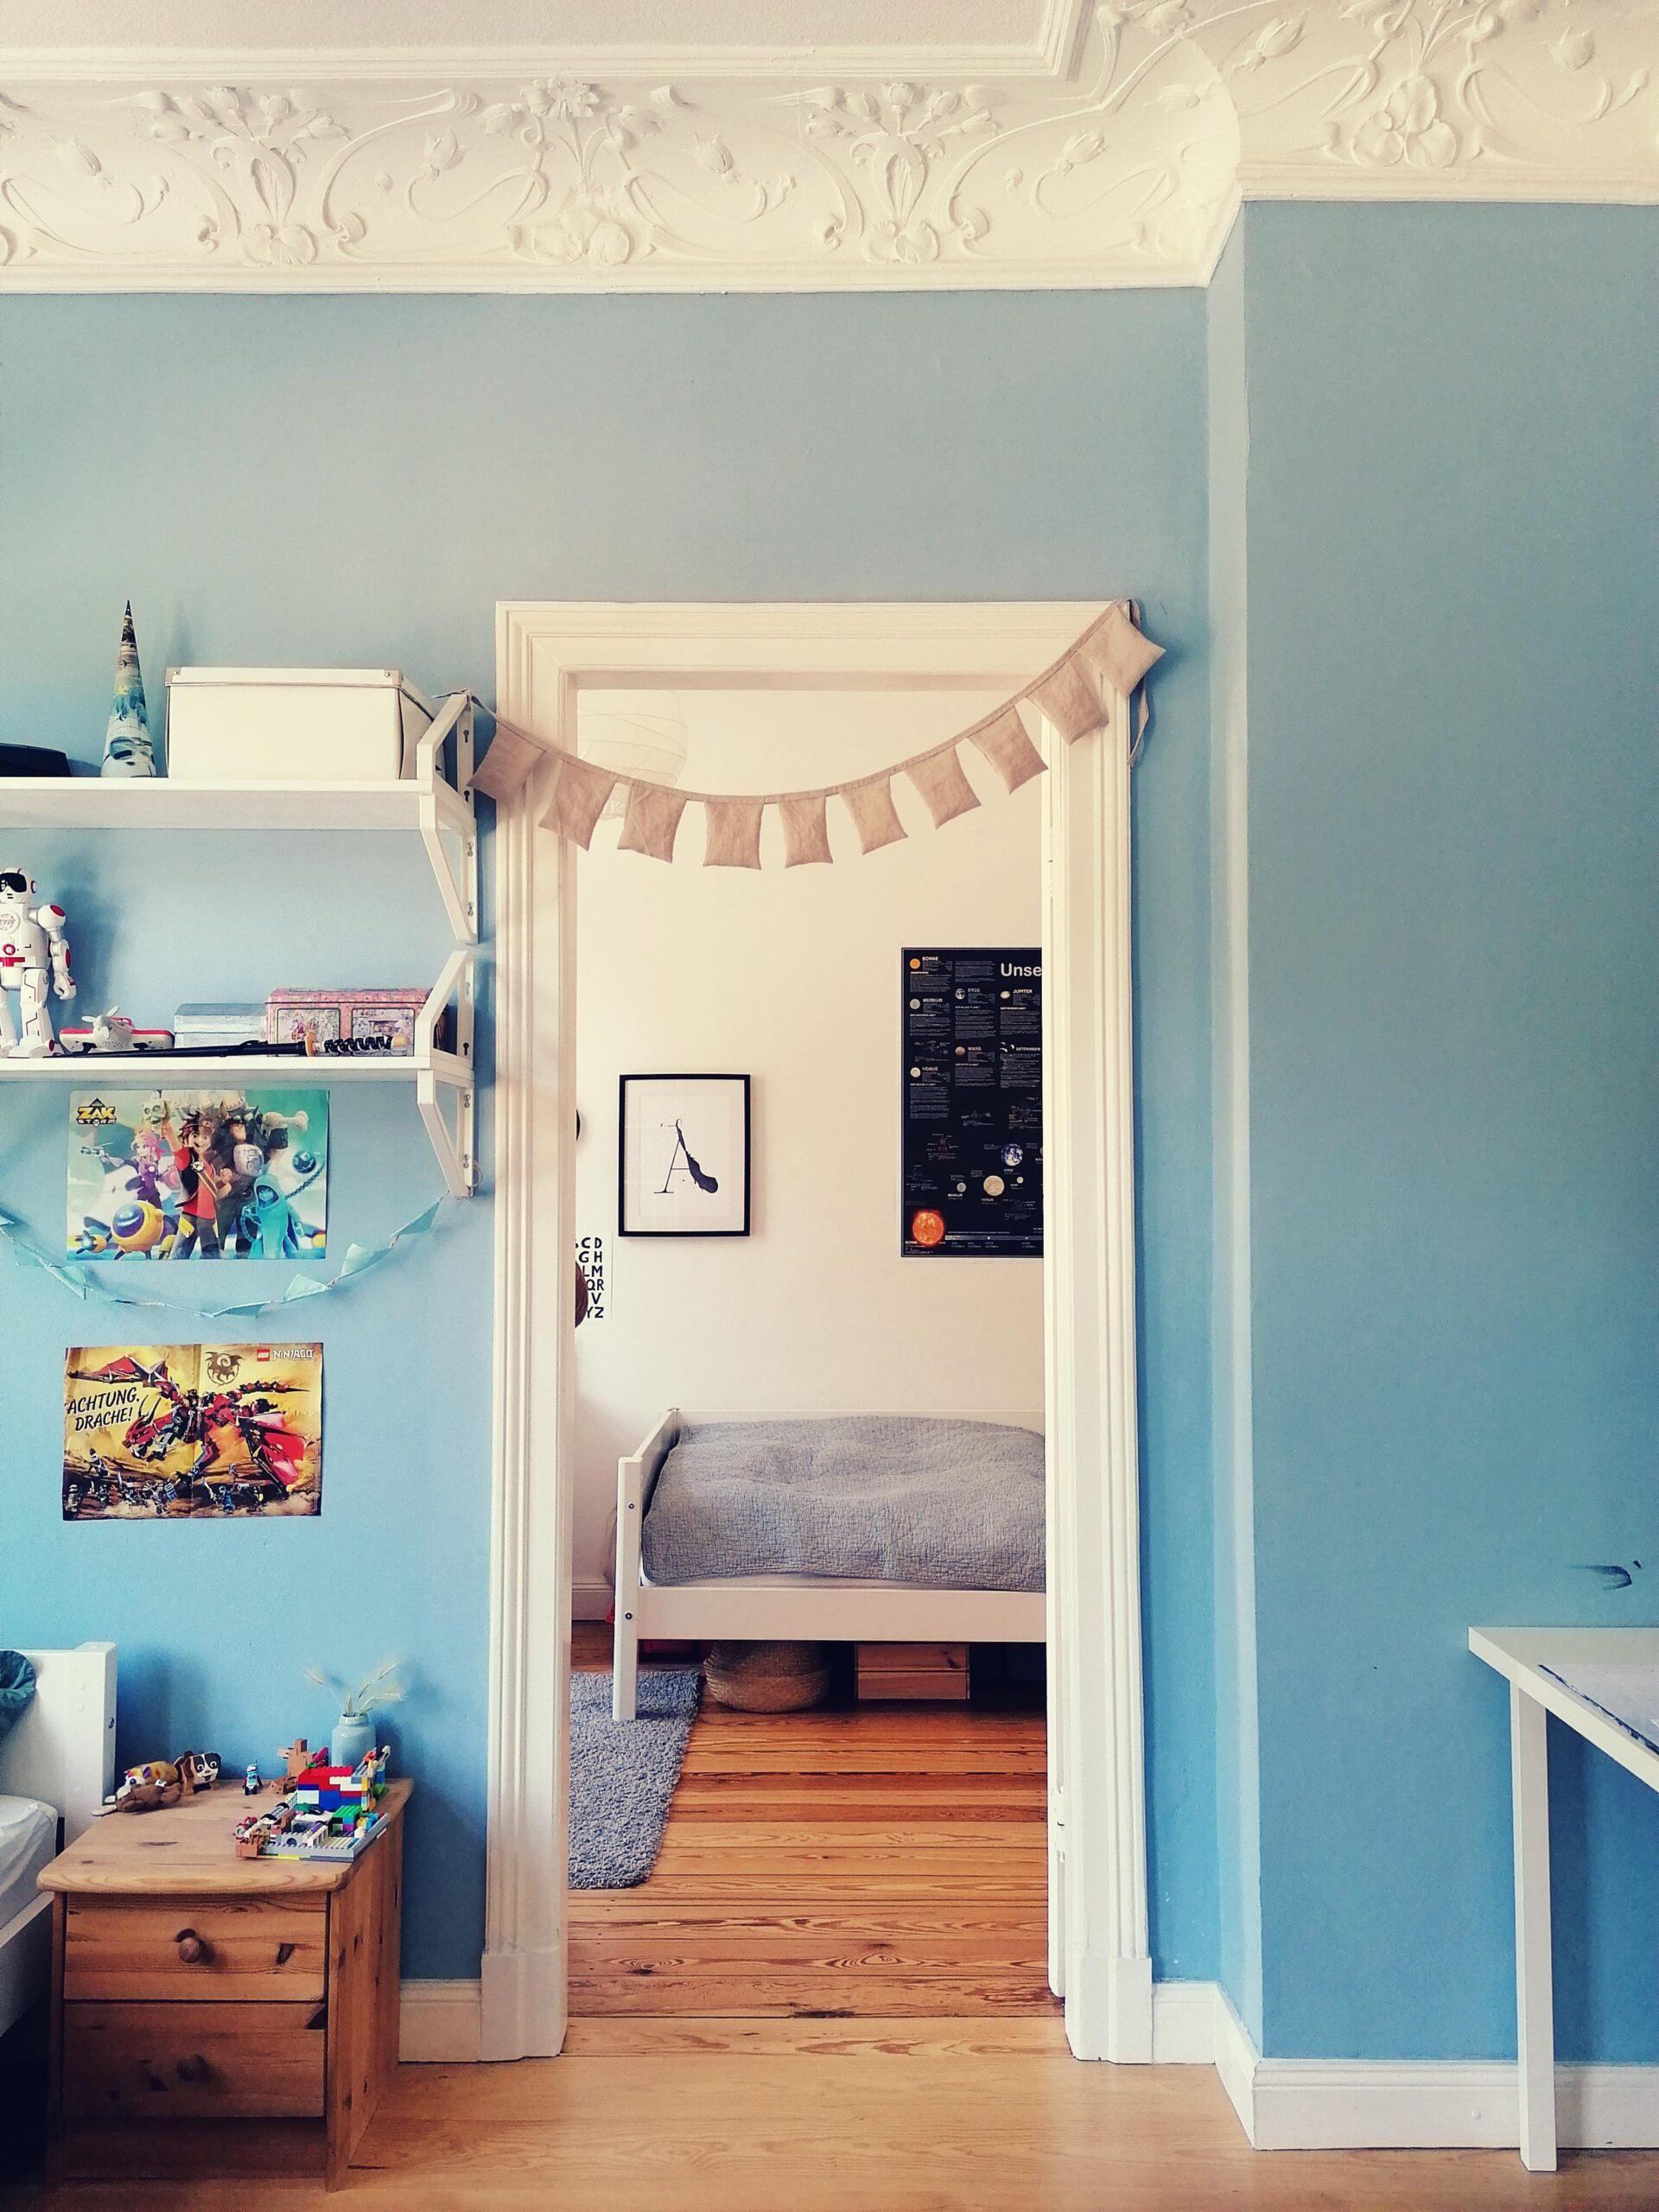 Full Size of Raumteiler Kinderzimmer Durchgangszimmer Bilder Ideen Couch Regal Weiß Sofa Regale Kinderzimmer Raumteiler Kinderzimmer